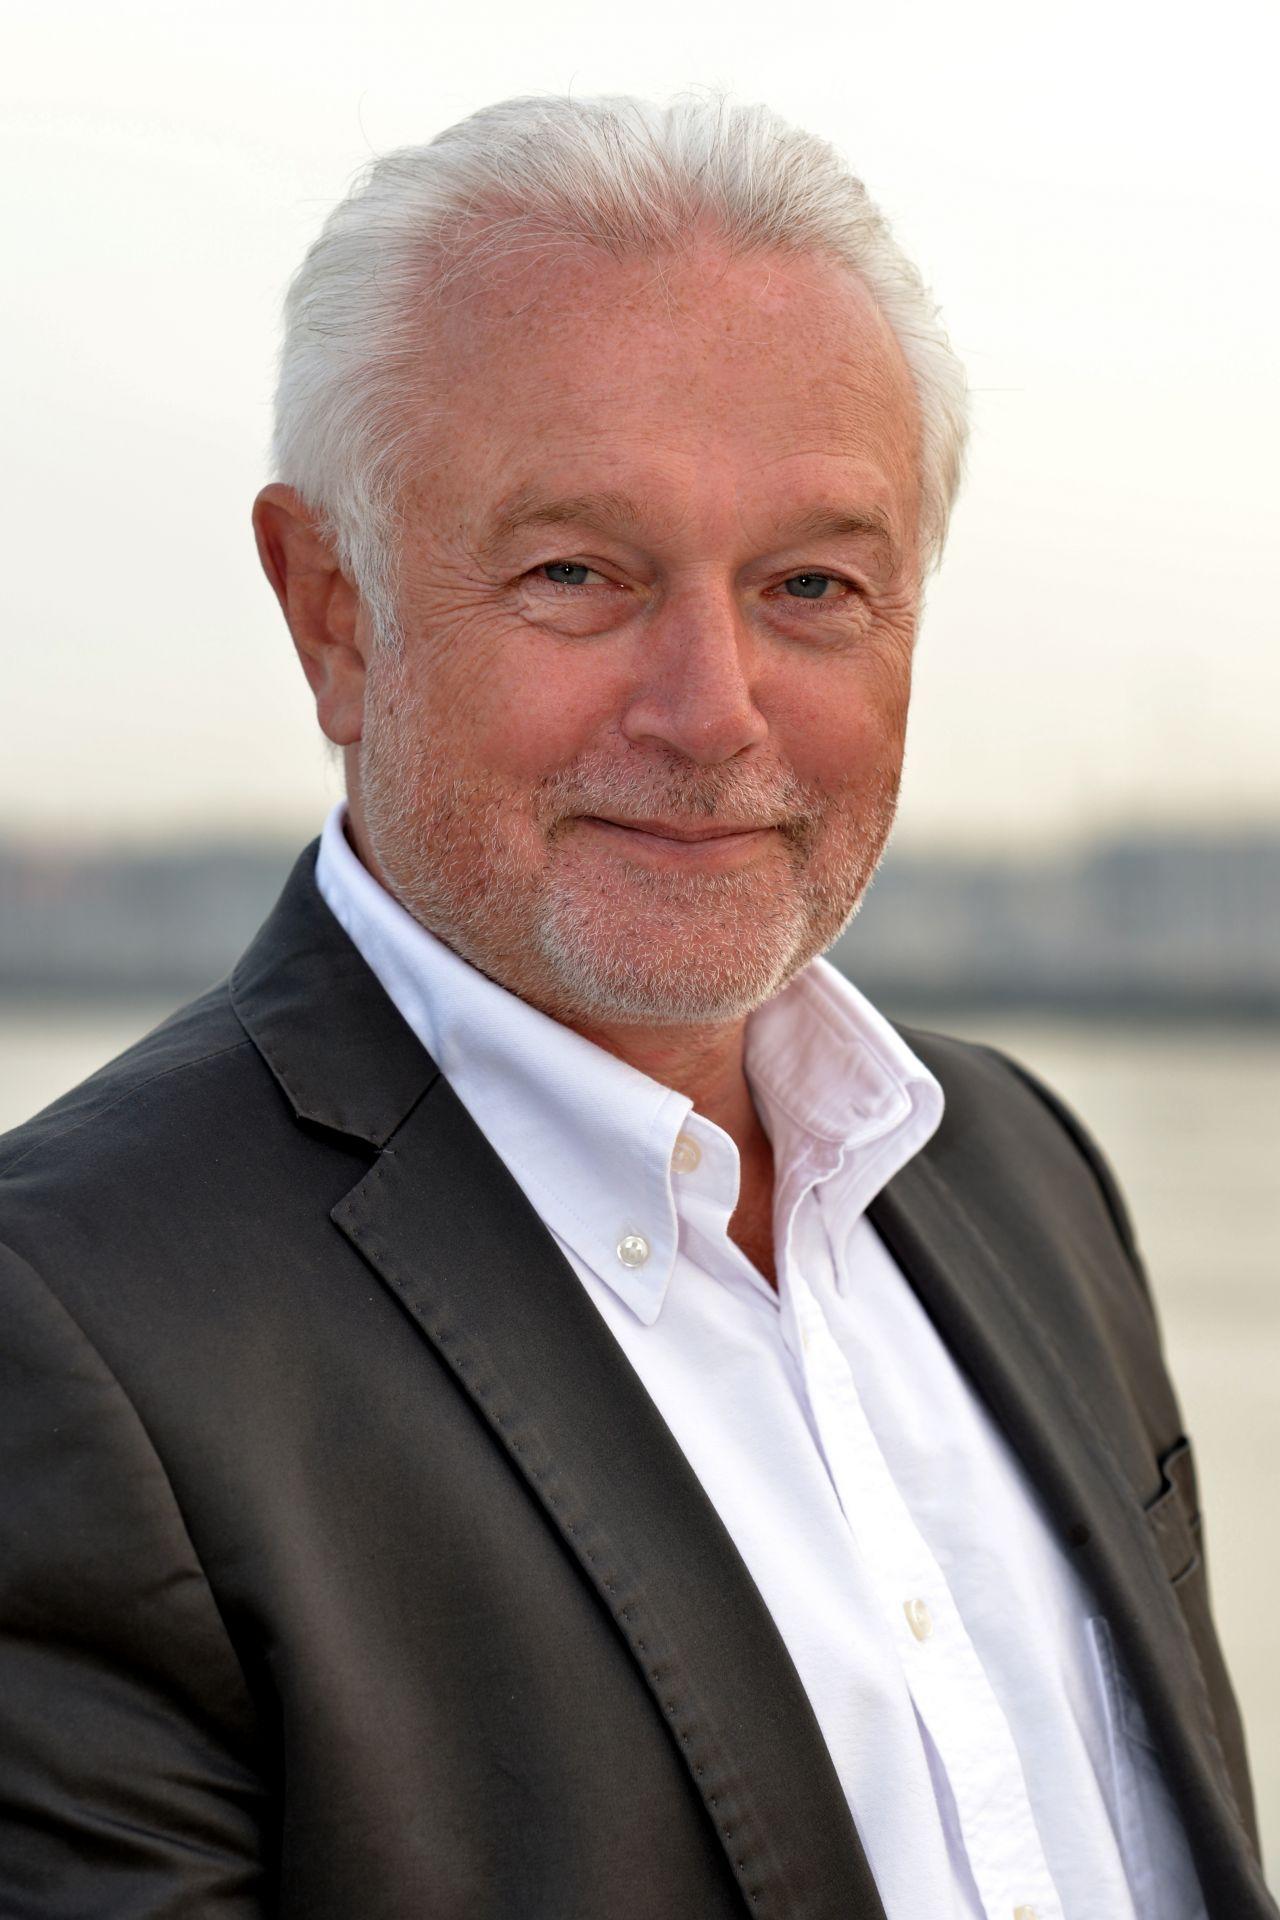 Freie-Demokraten-FDP-Stadtverband-Wedel-Wolfgang-Kubicki